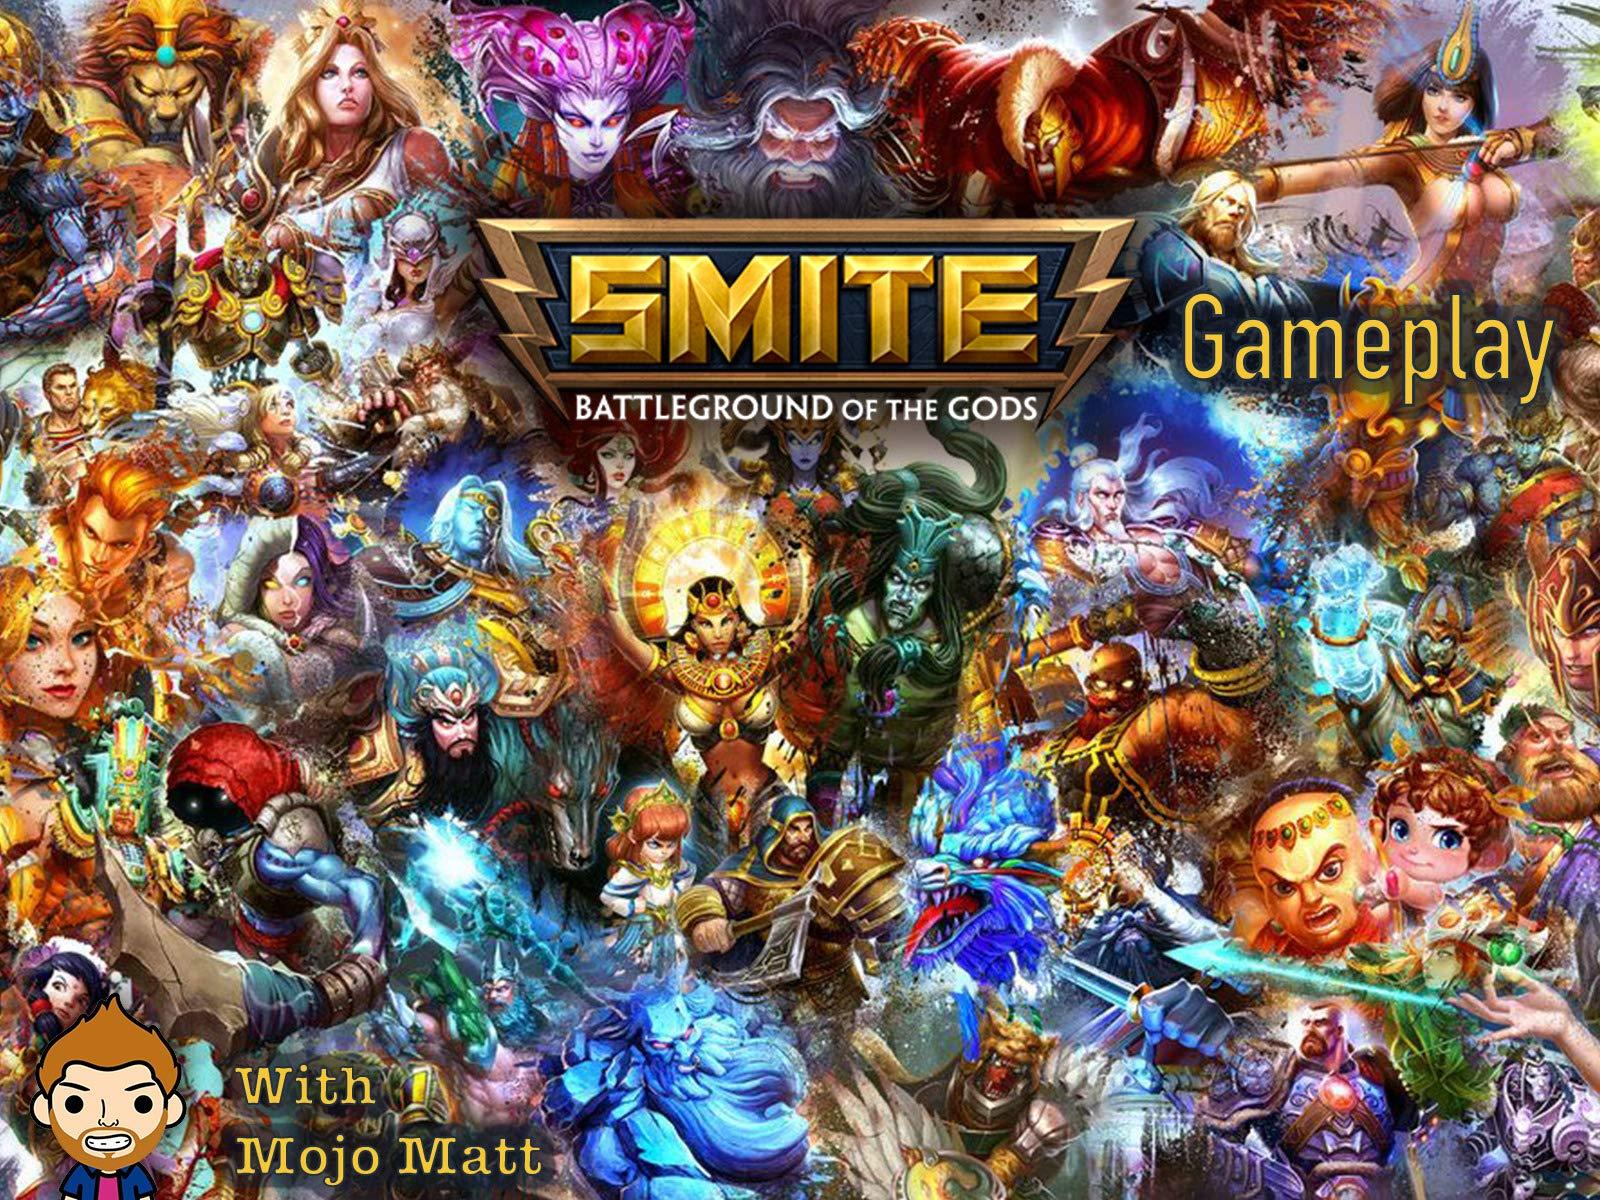 Smite Battleground Of The Gods Gameplay With Mojo Matt on Amazon Prime Instant Video UK